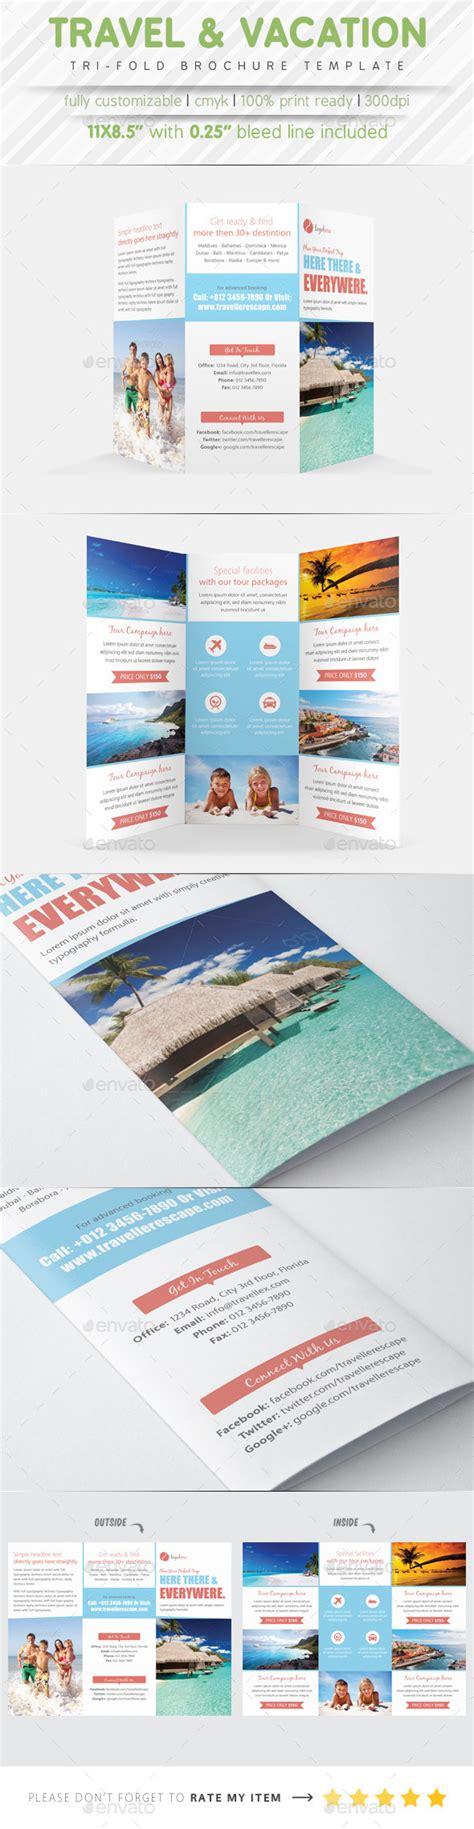 Travel Brochure Template 3 Fold by Travel Agency 3 Fold Brochure Bundle 187 Dondrup